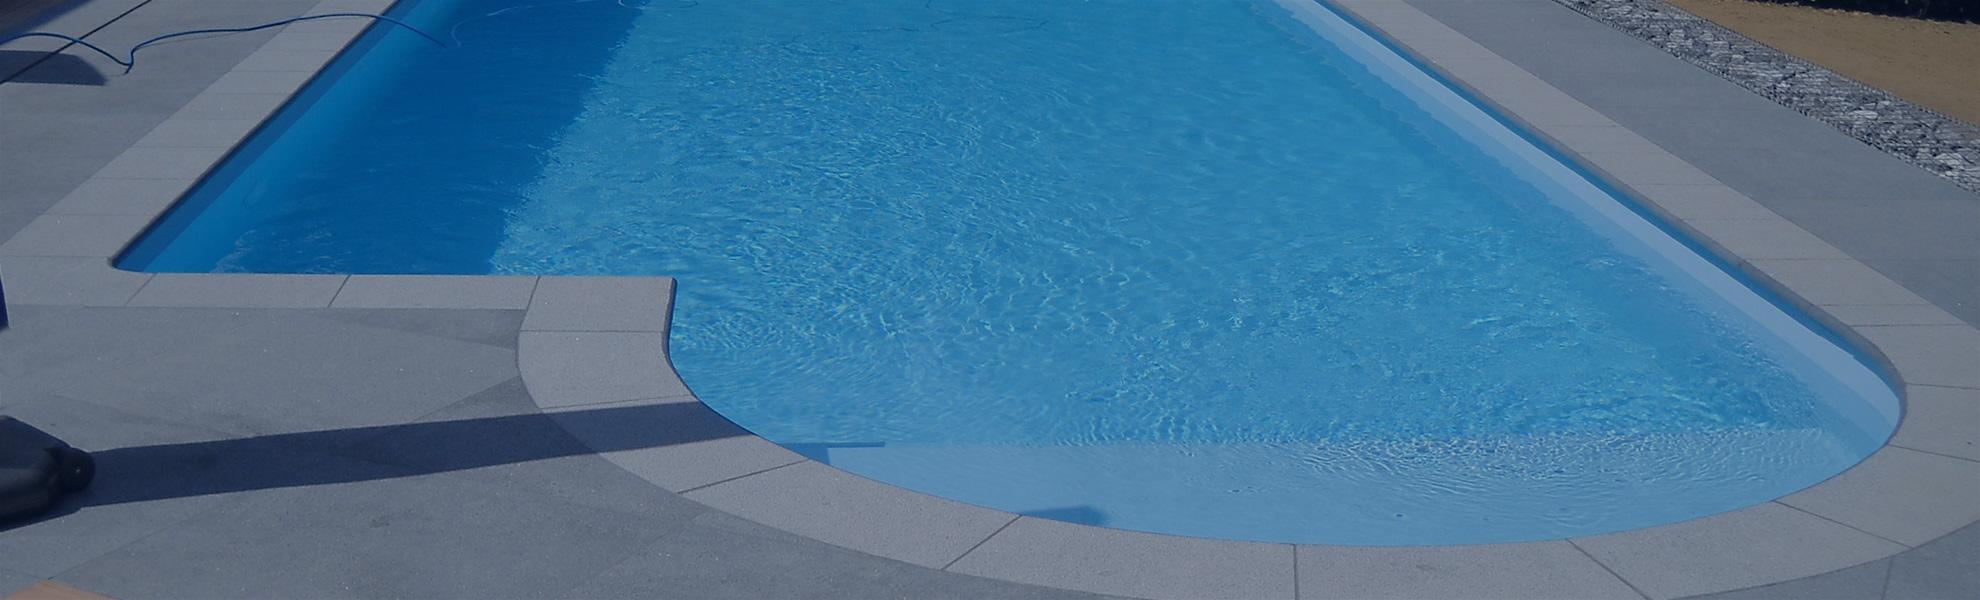 Construction et r alisation de piscine spa sauna hammam for Realiser piscine beton